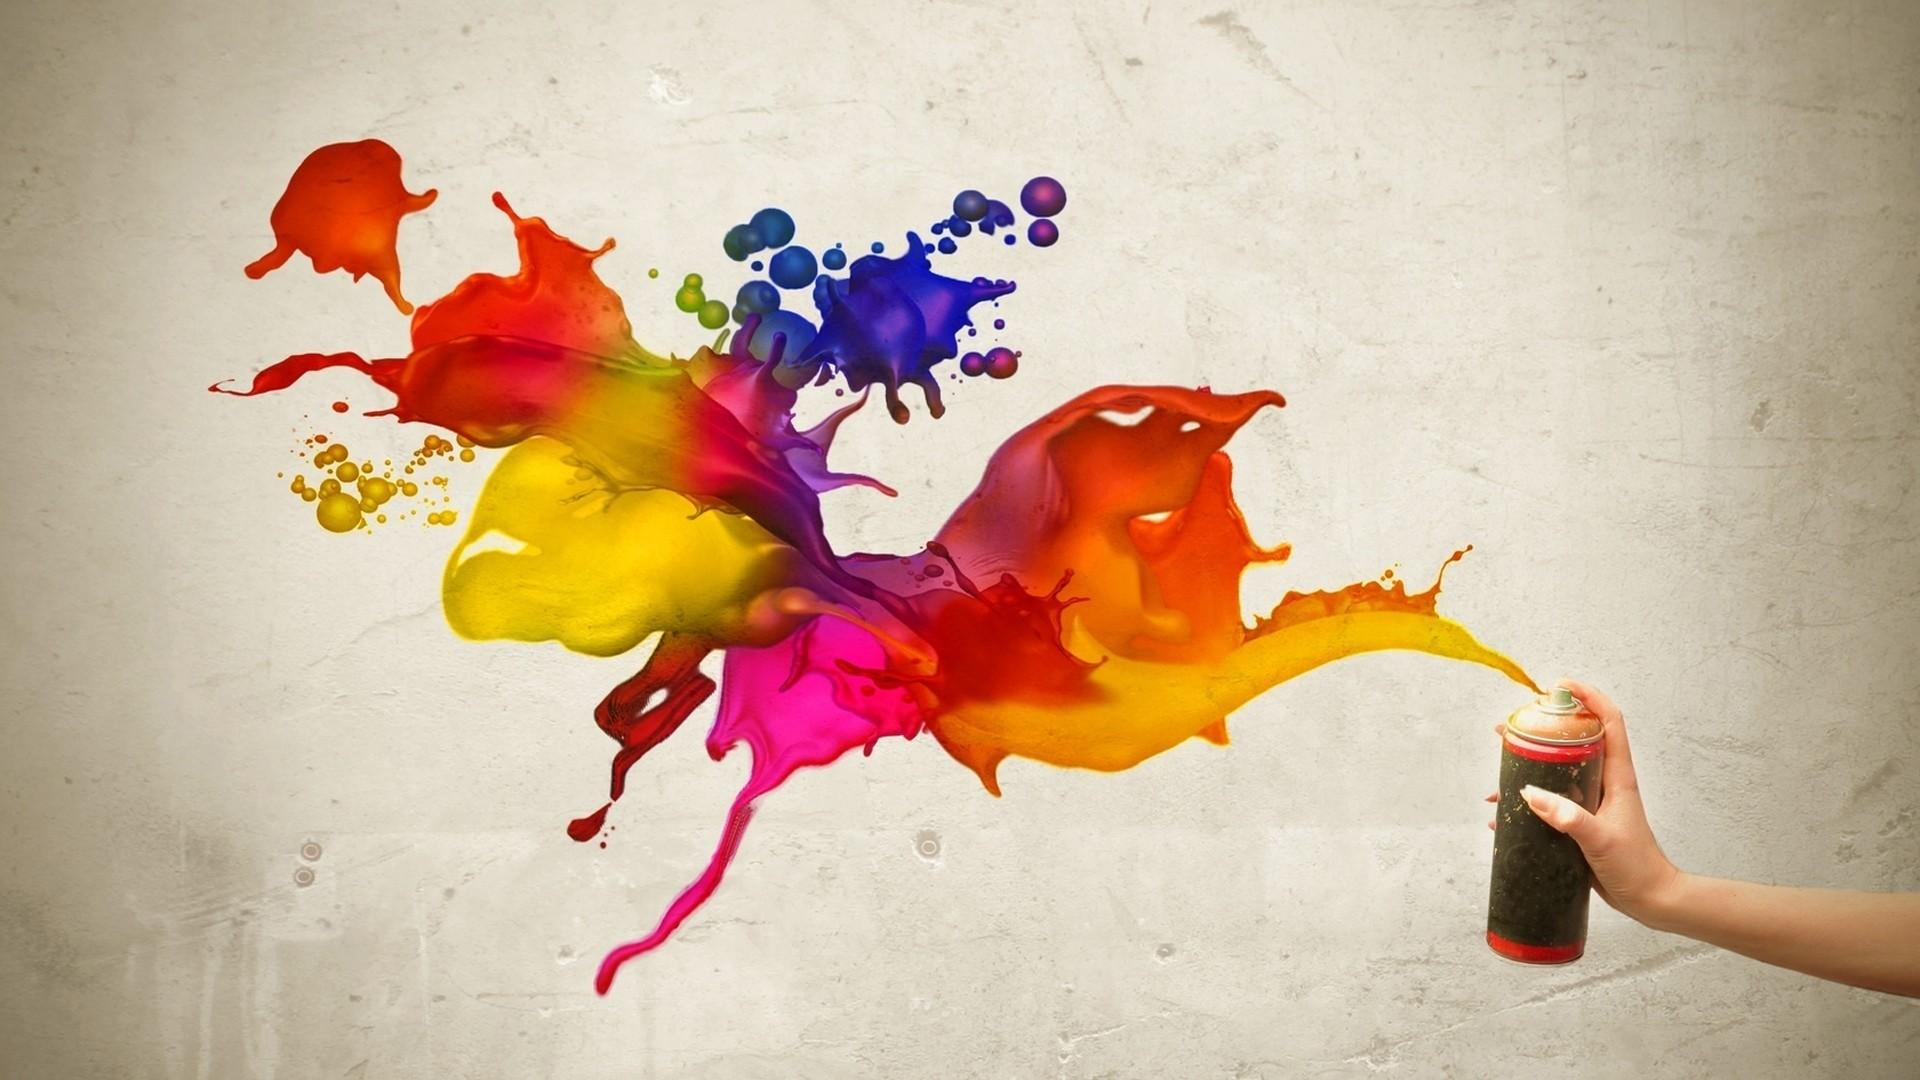 Paint Splash HD Wallpaper